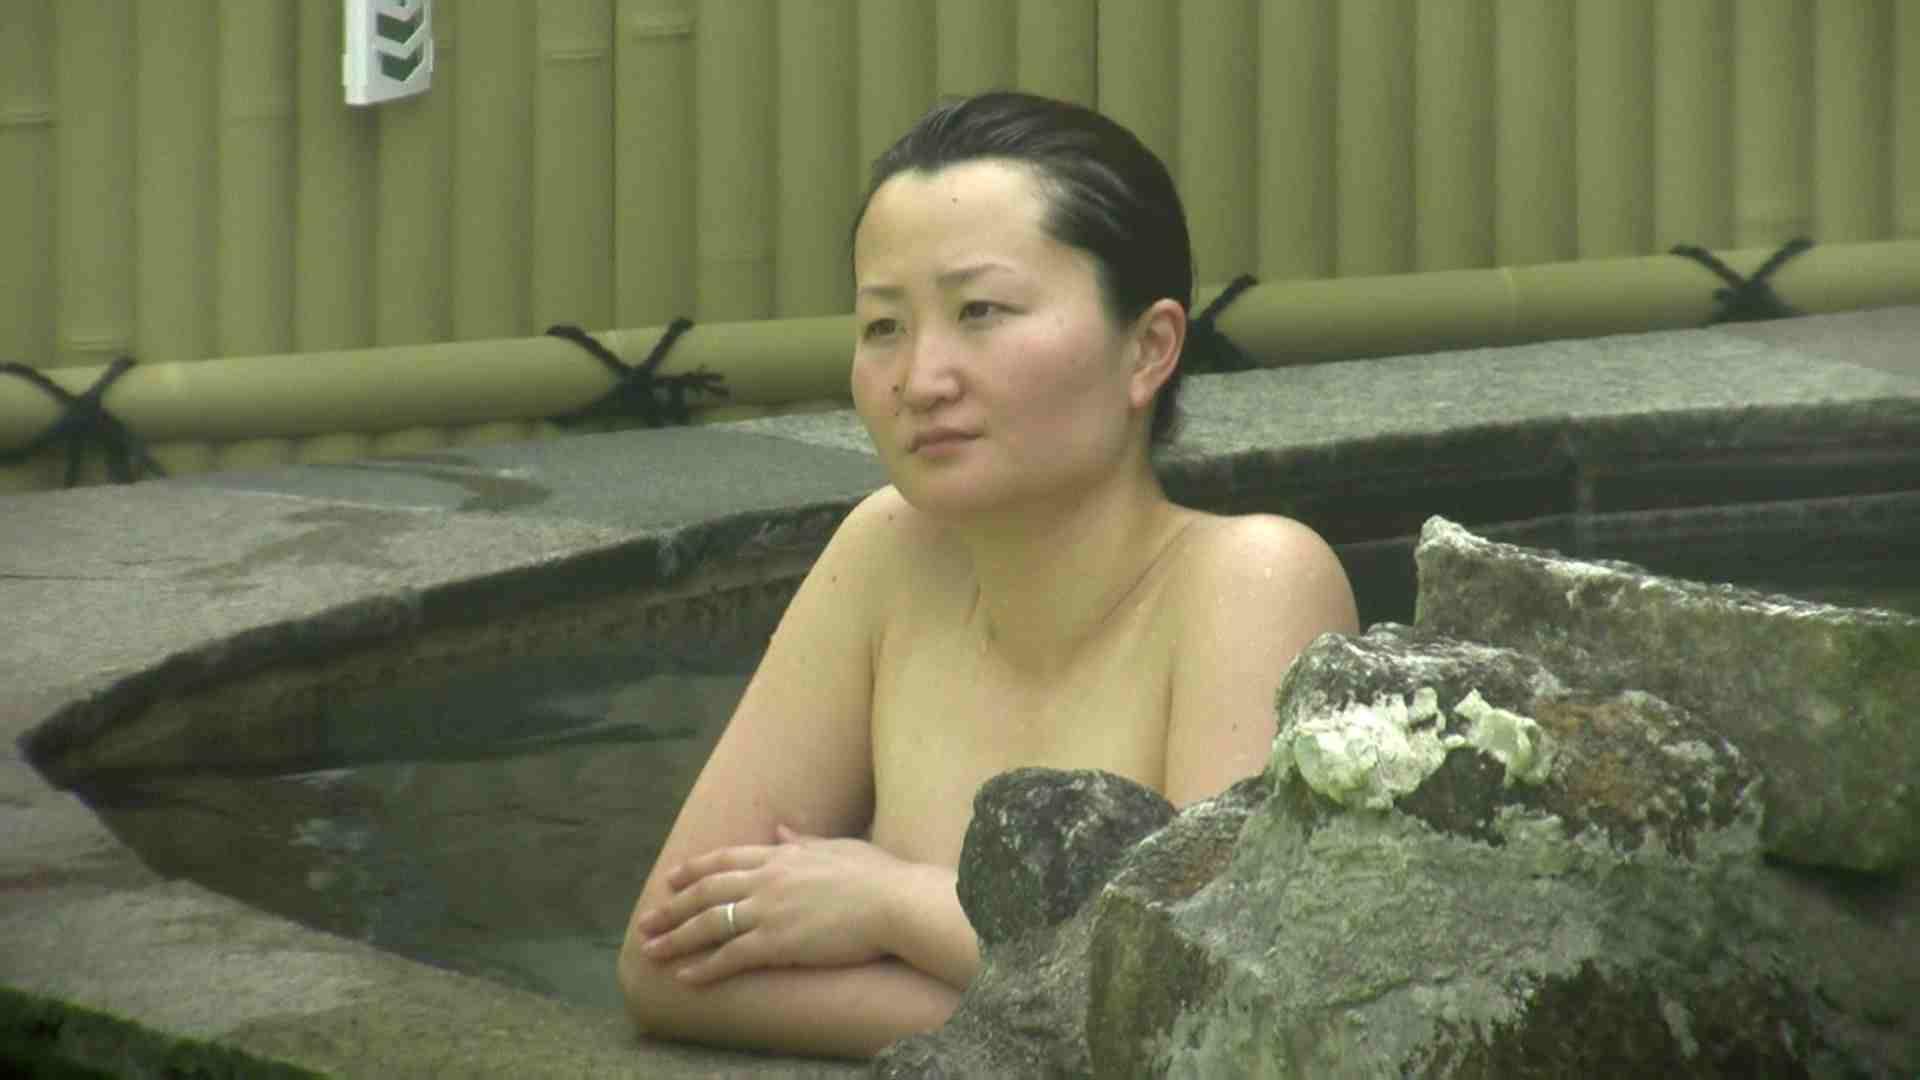 Aquaな露天風呂Vol.632 盗撮 | OLセックス  70画像 10